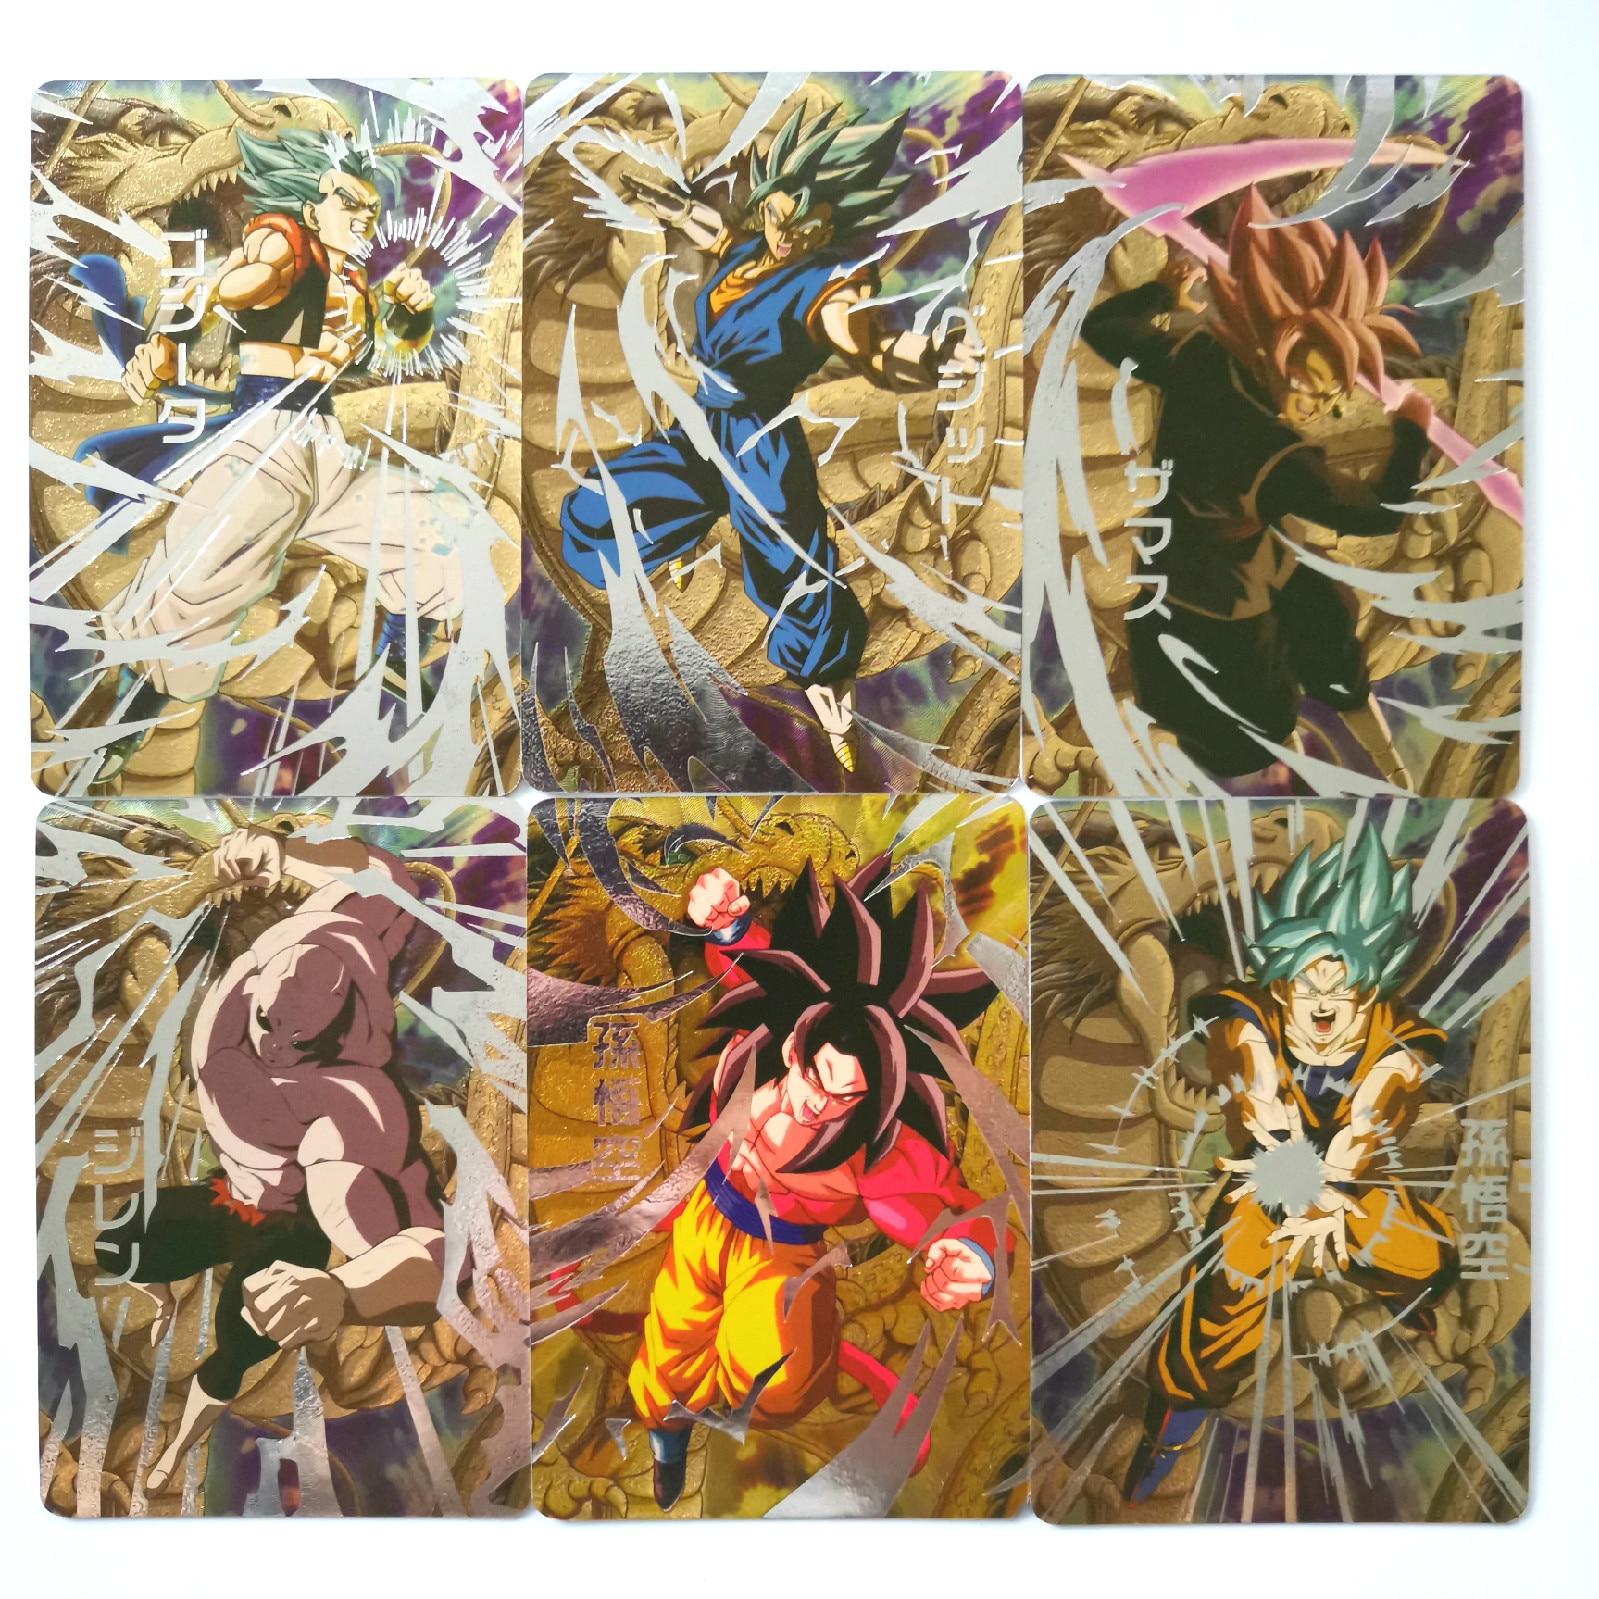 32 pièces/ensemble Super Dragon Ball seulement 37 ensembles héros bataille carte Ultra Instinct Goku végéta jeu Collection Anime cartes